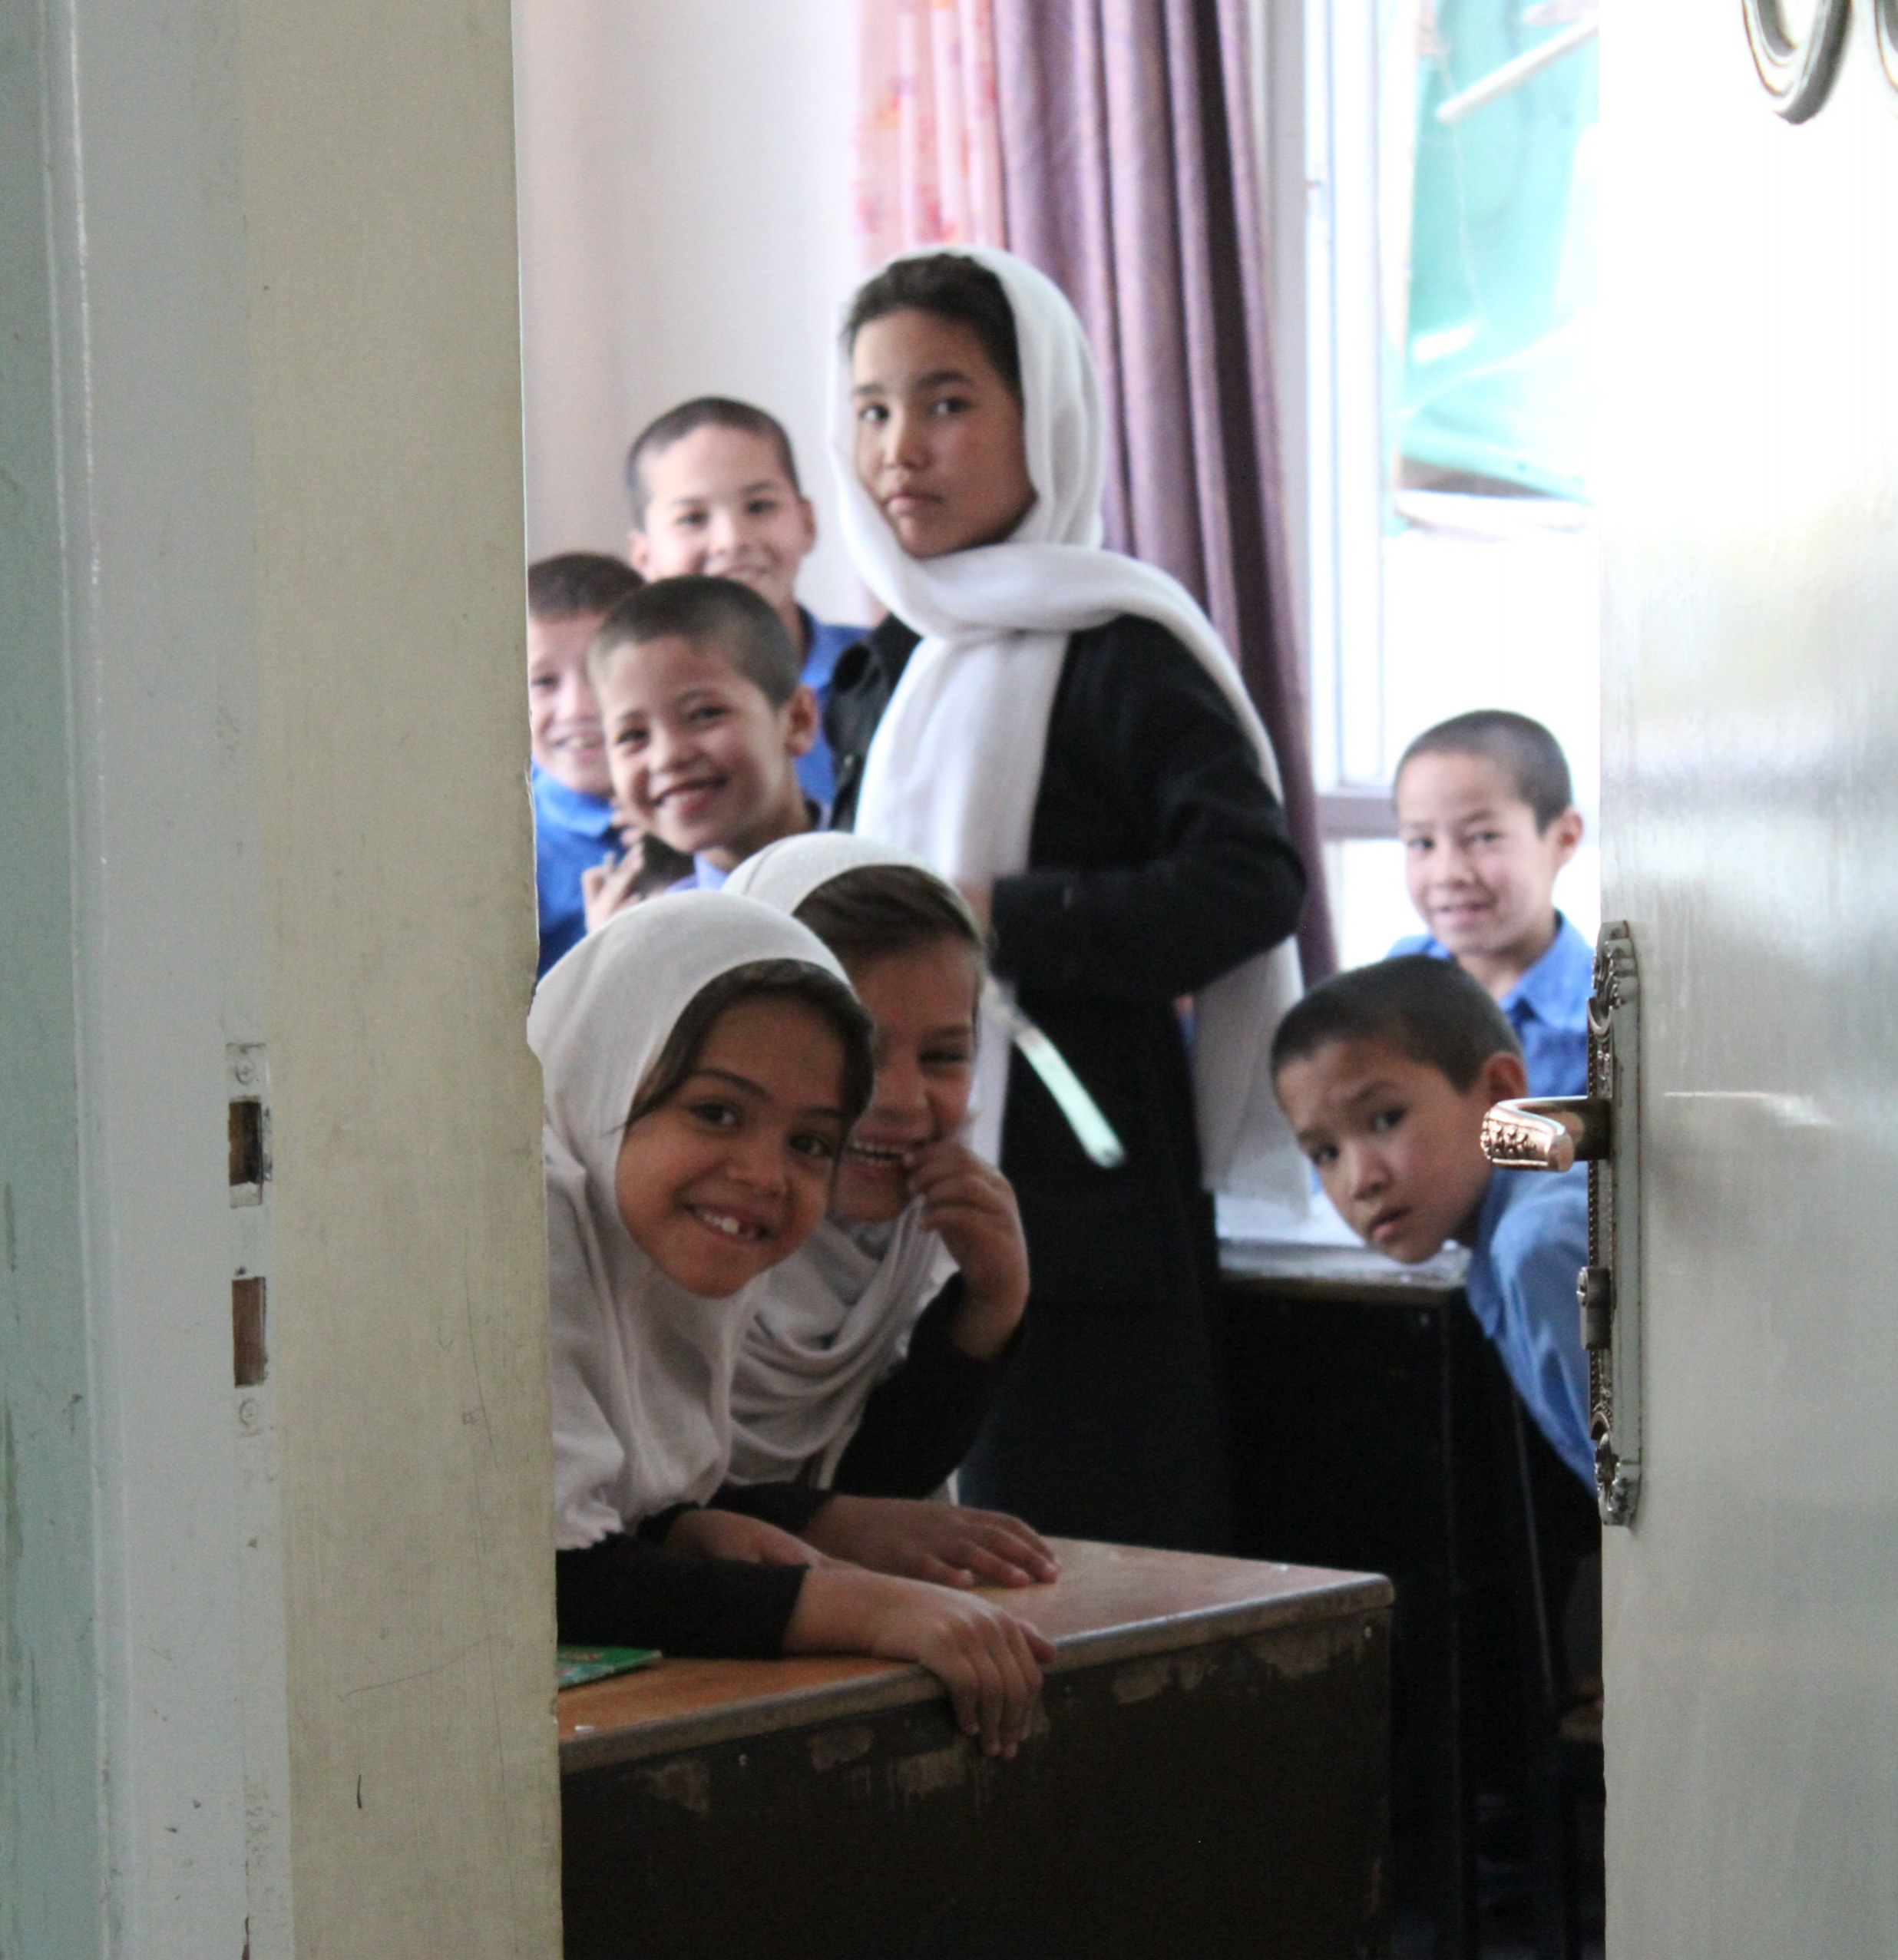 Marofa - #3032 | FemaleAge When Starting School: 10